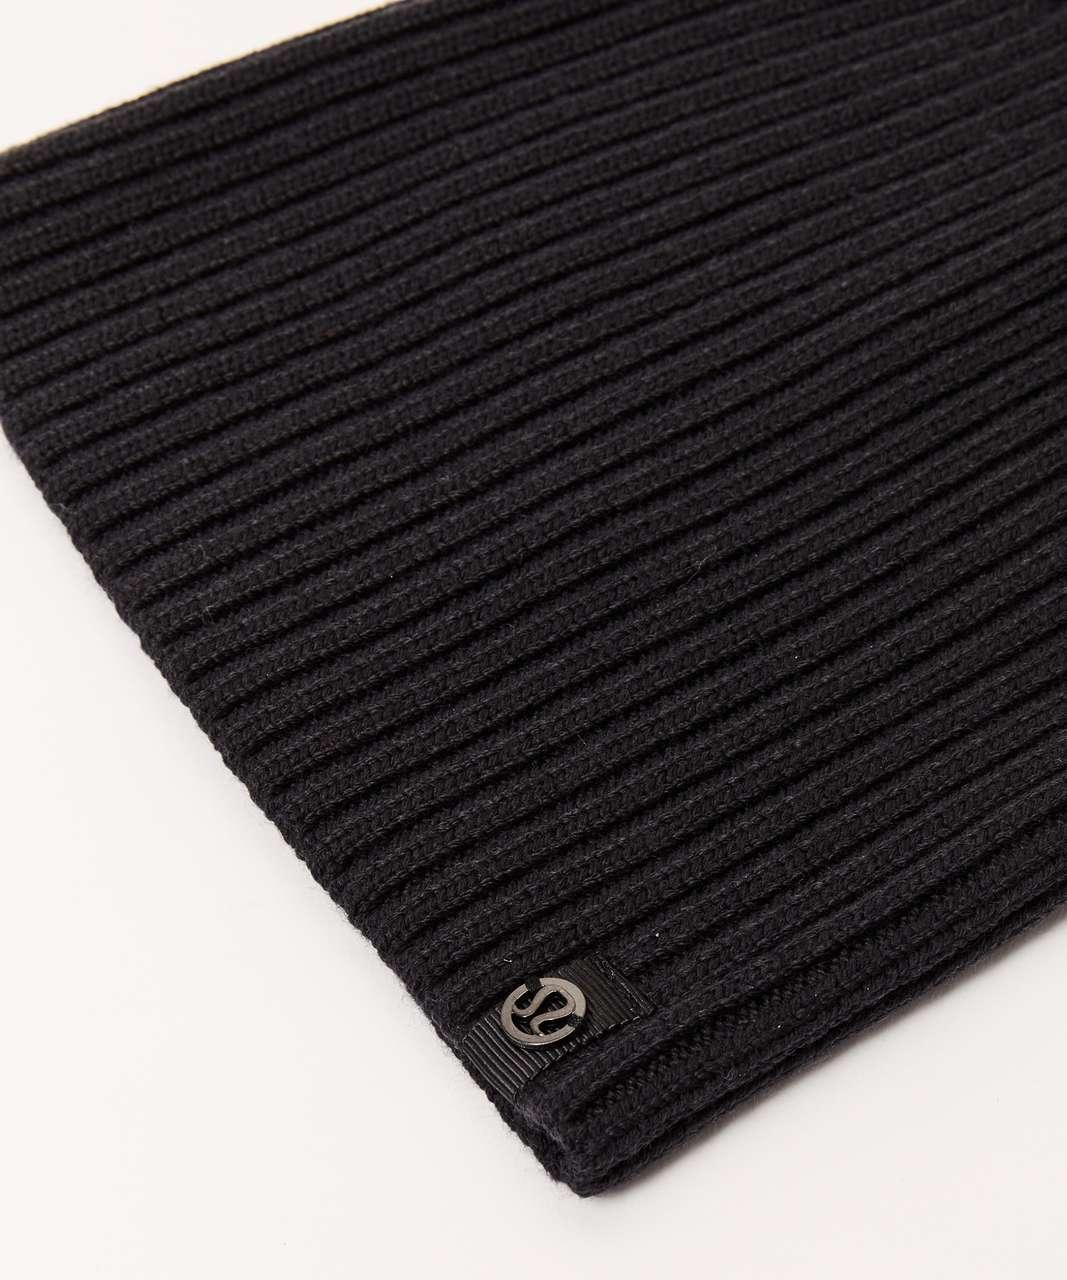 Lululemon Wool Be Cozy Toque - Black